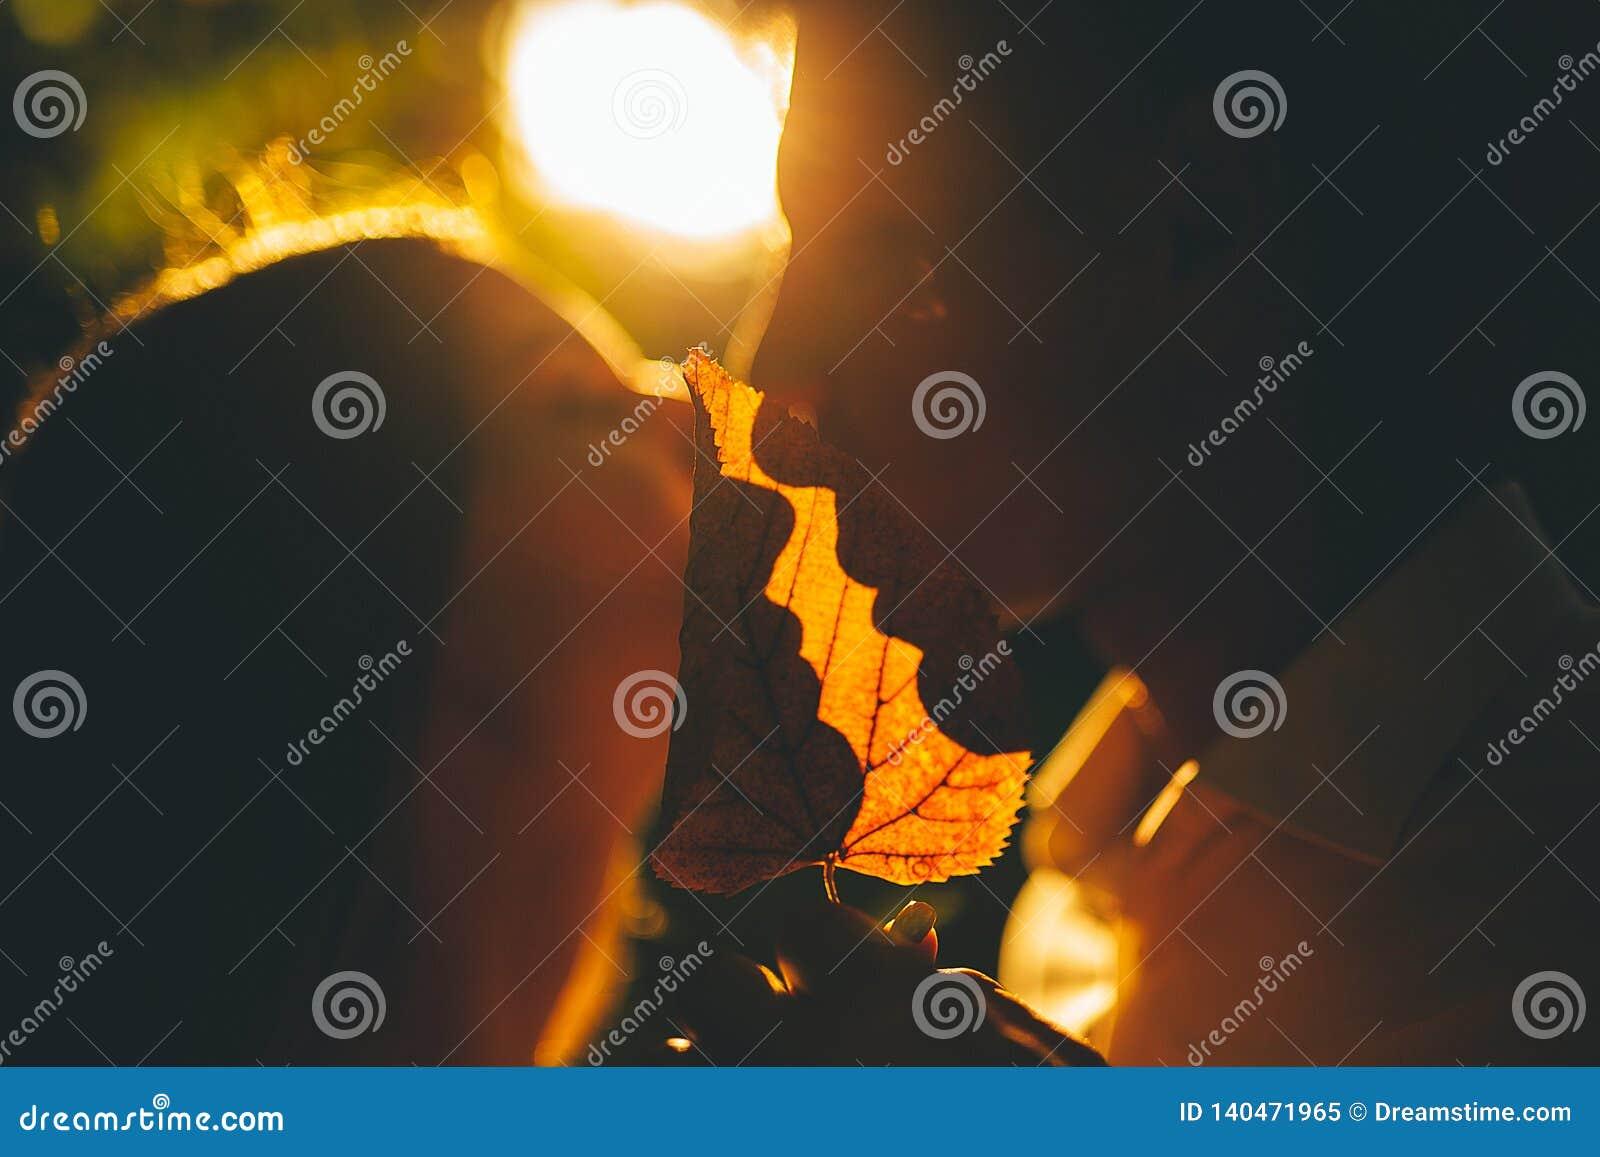 Тень губ любовников на пожелтетом листе